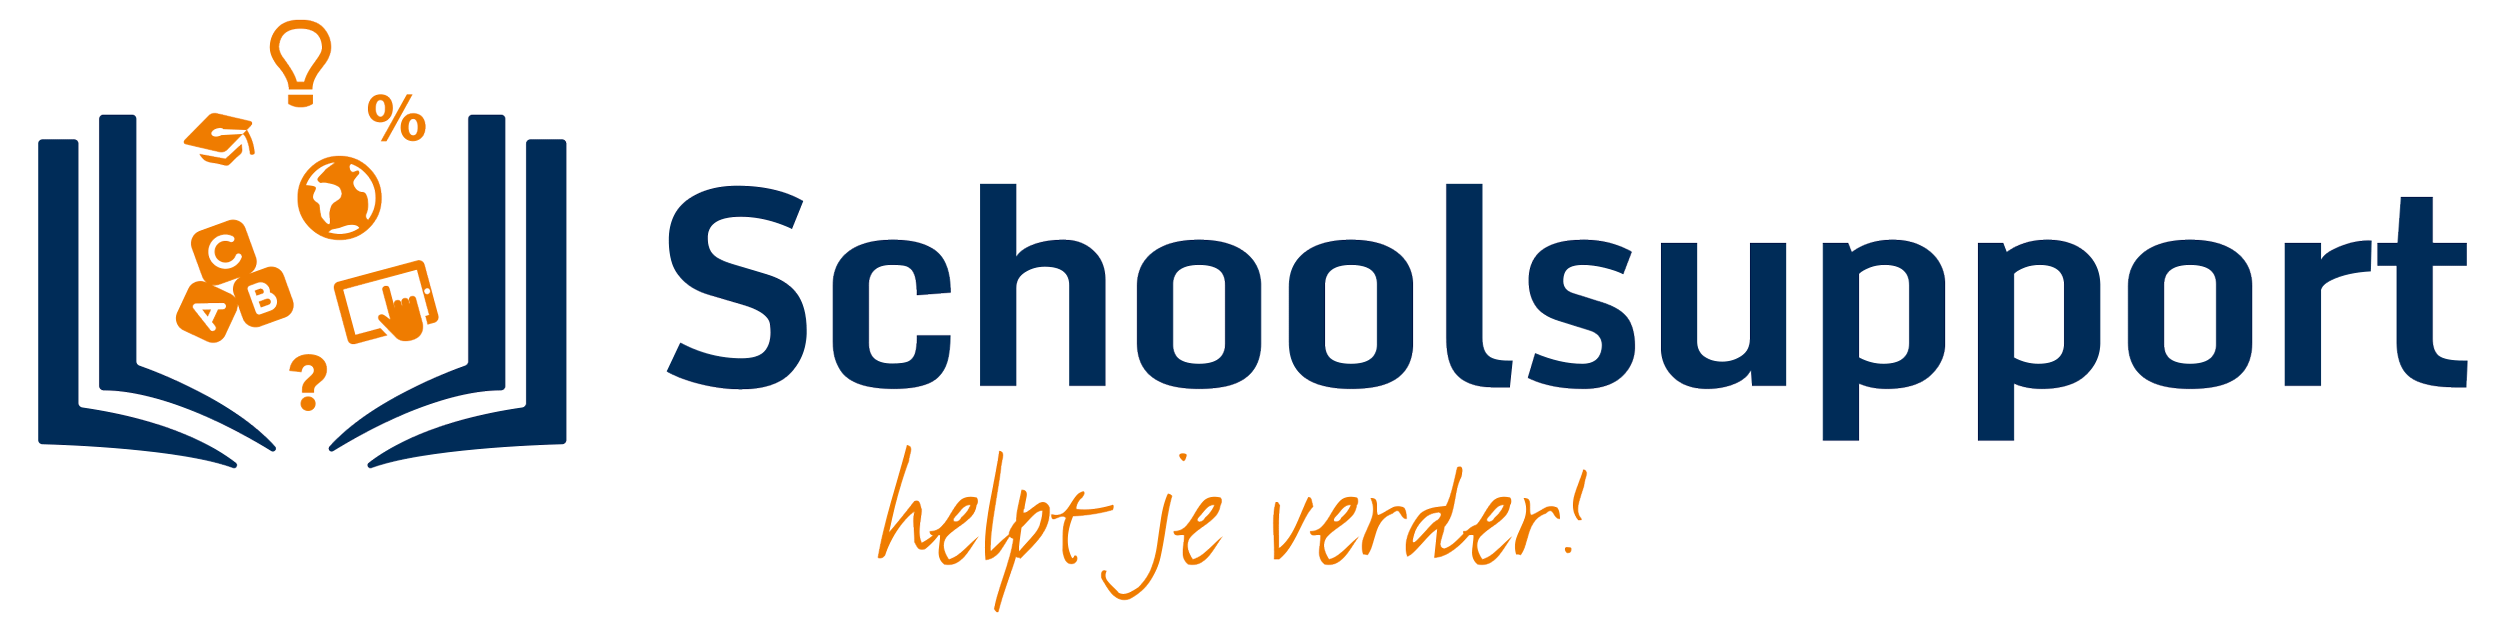 Schoolsupport